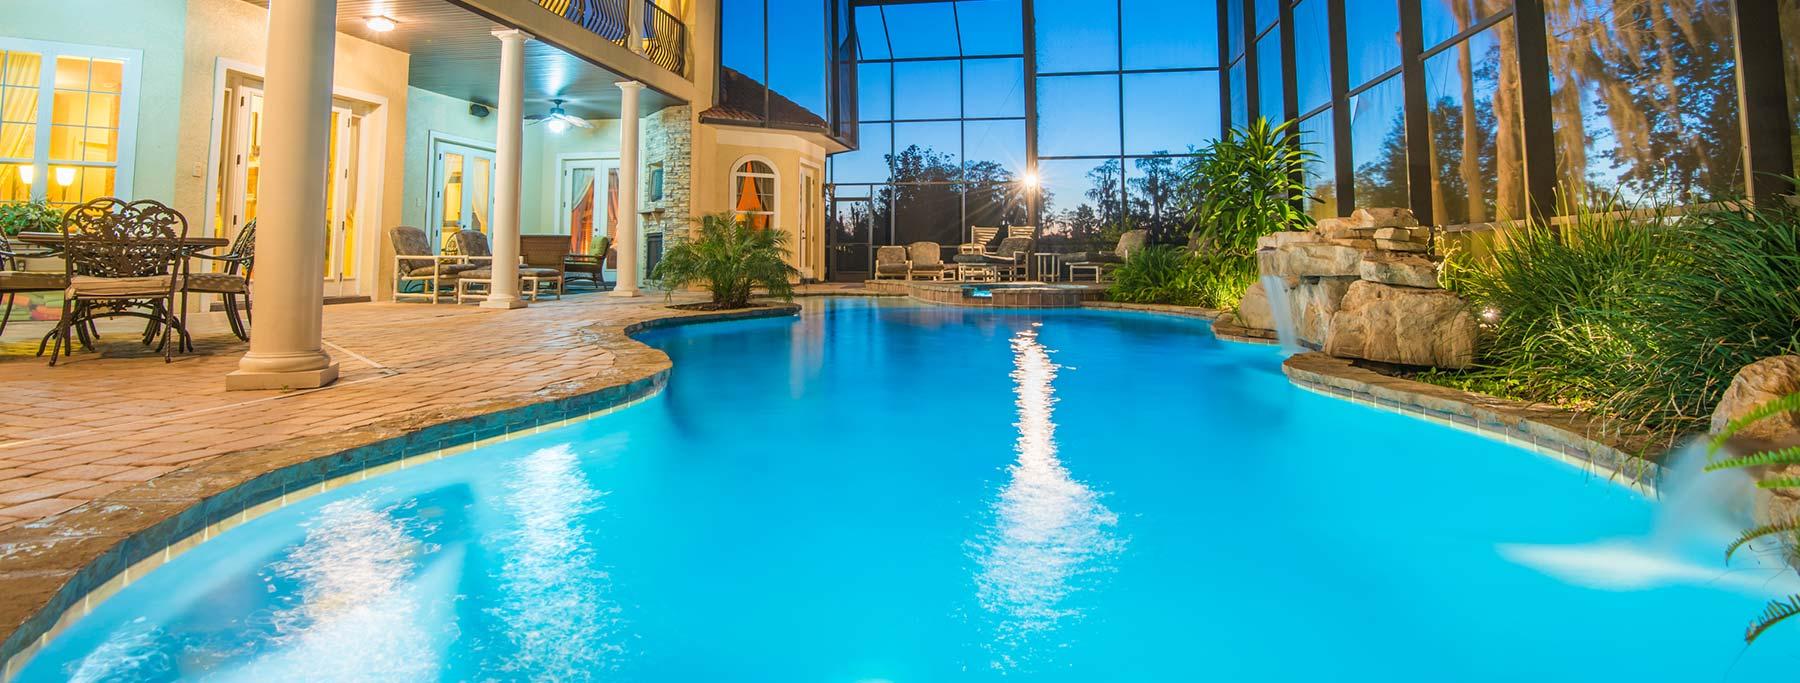 Gulf Coast Villas With Games Room